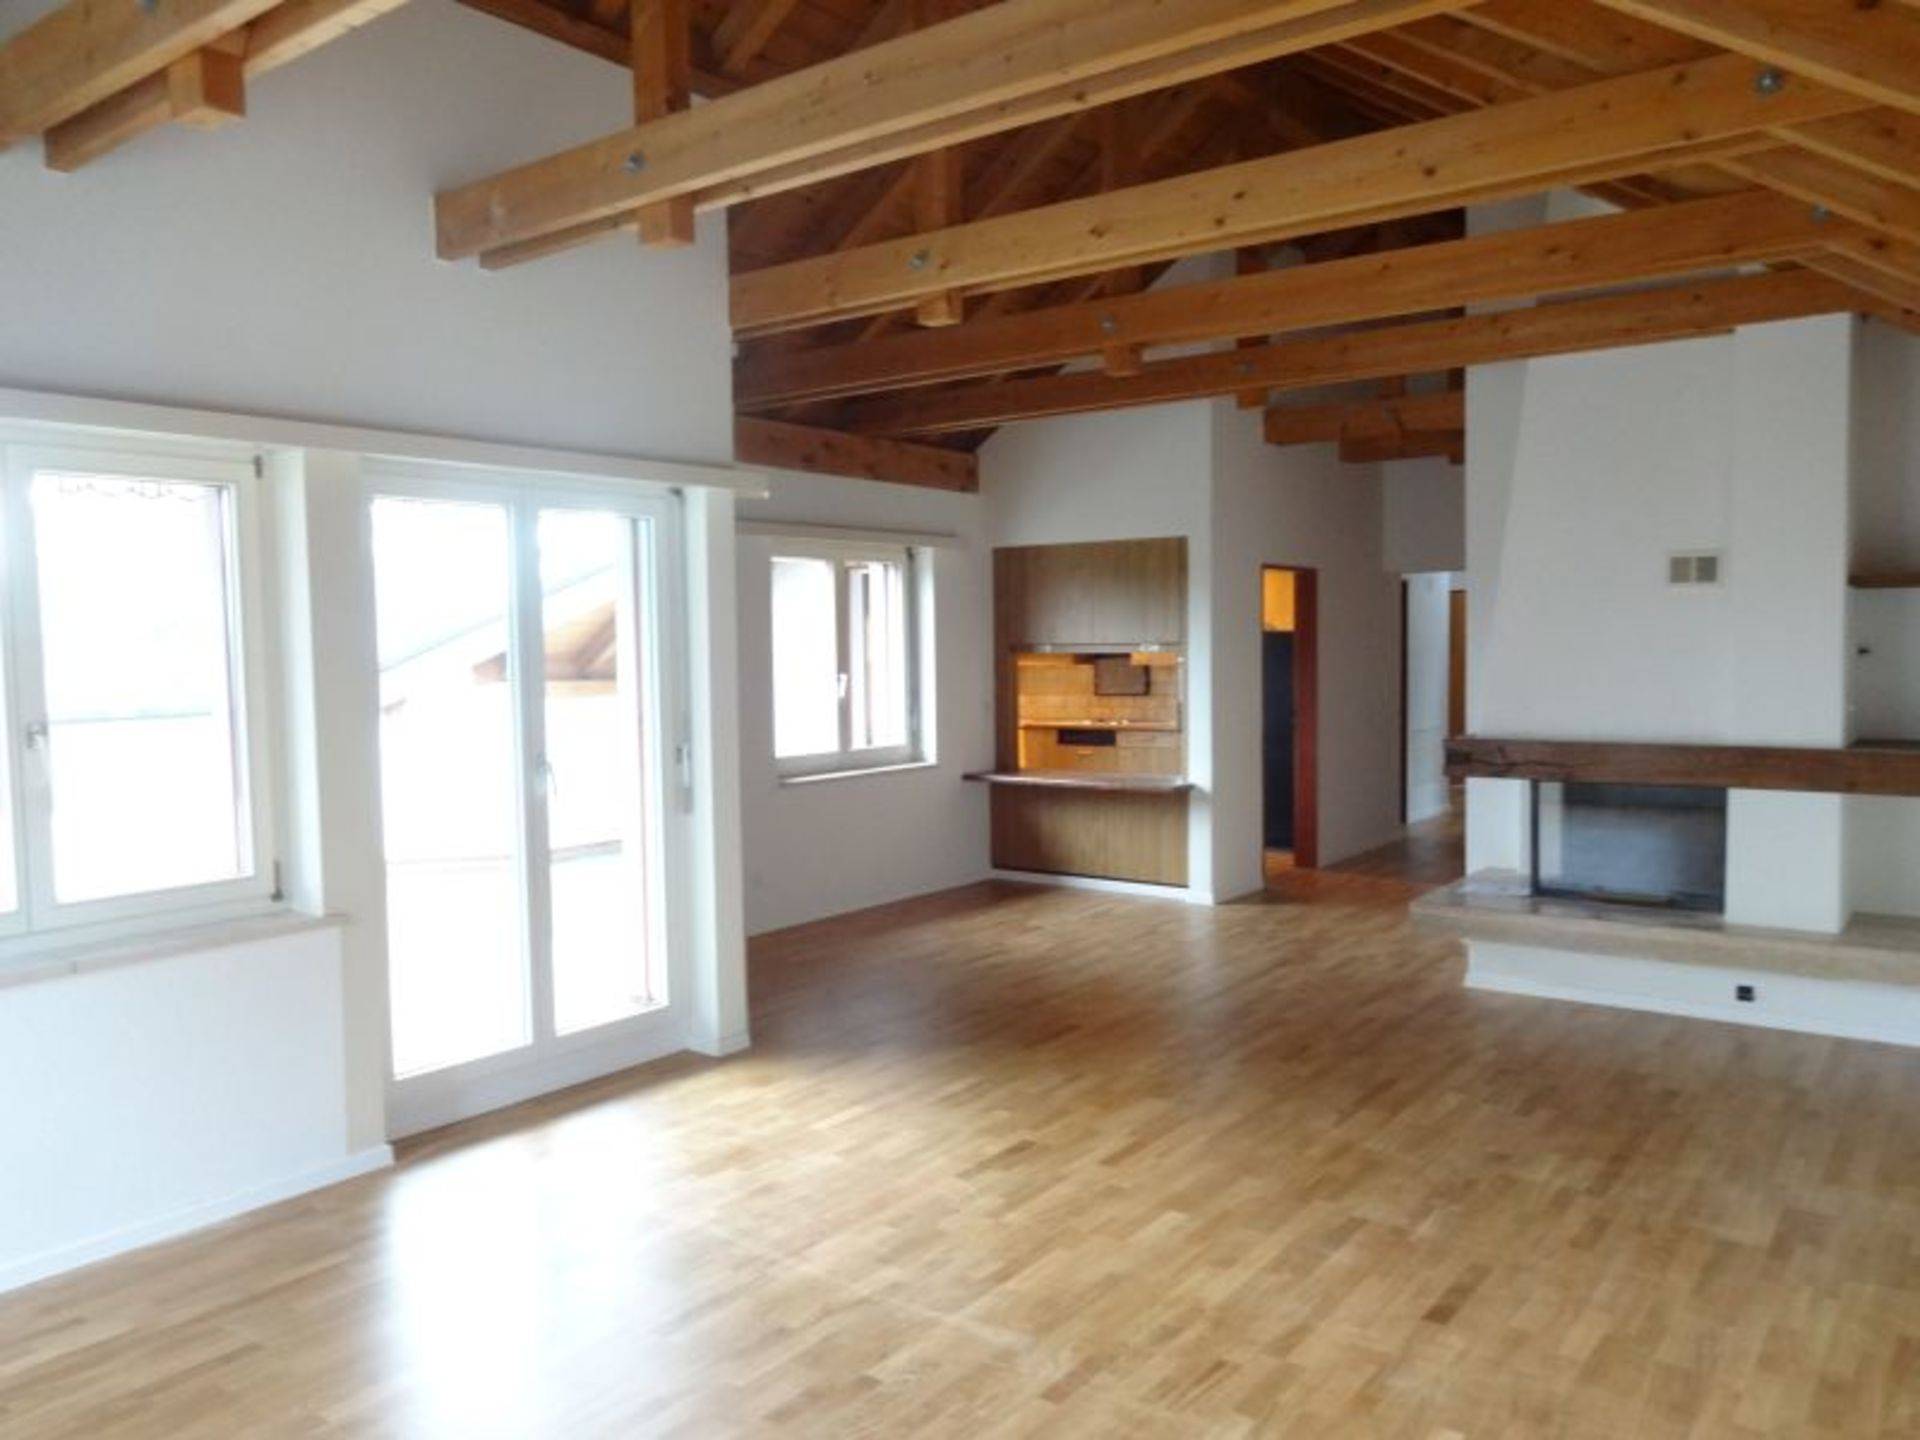 Miete: Wohnung mit grossartigem Ausblick